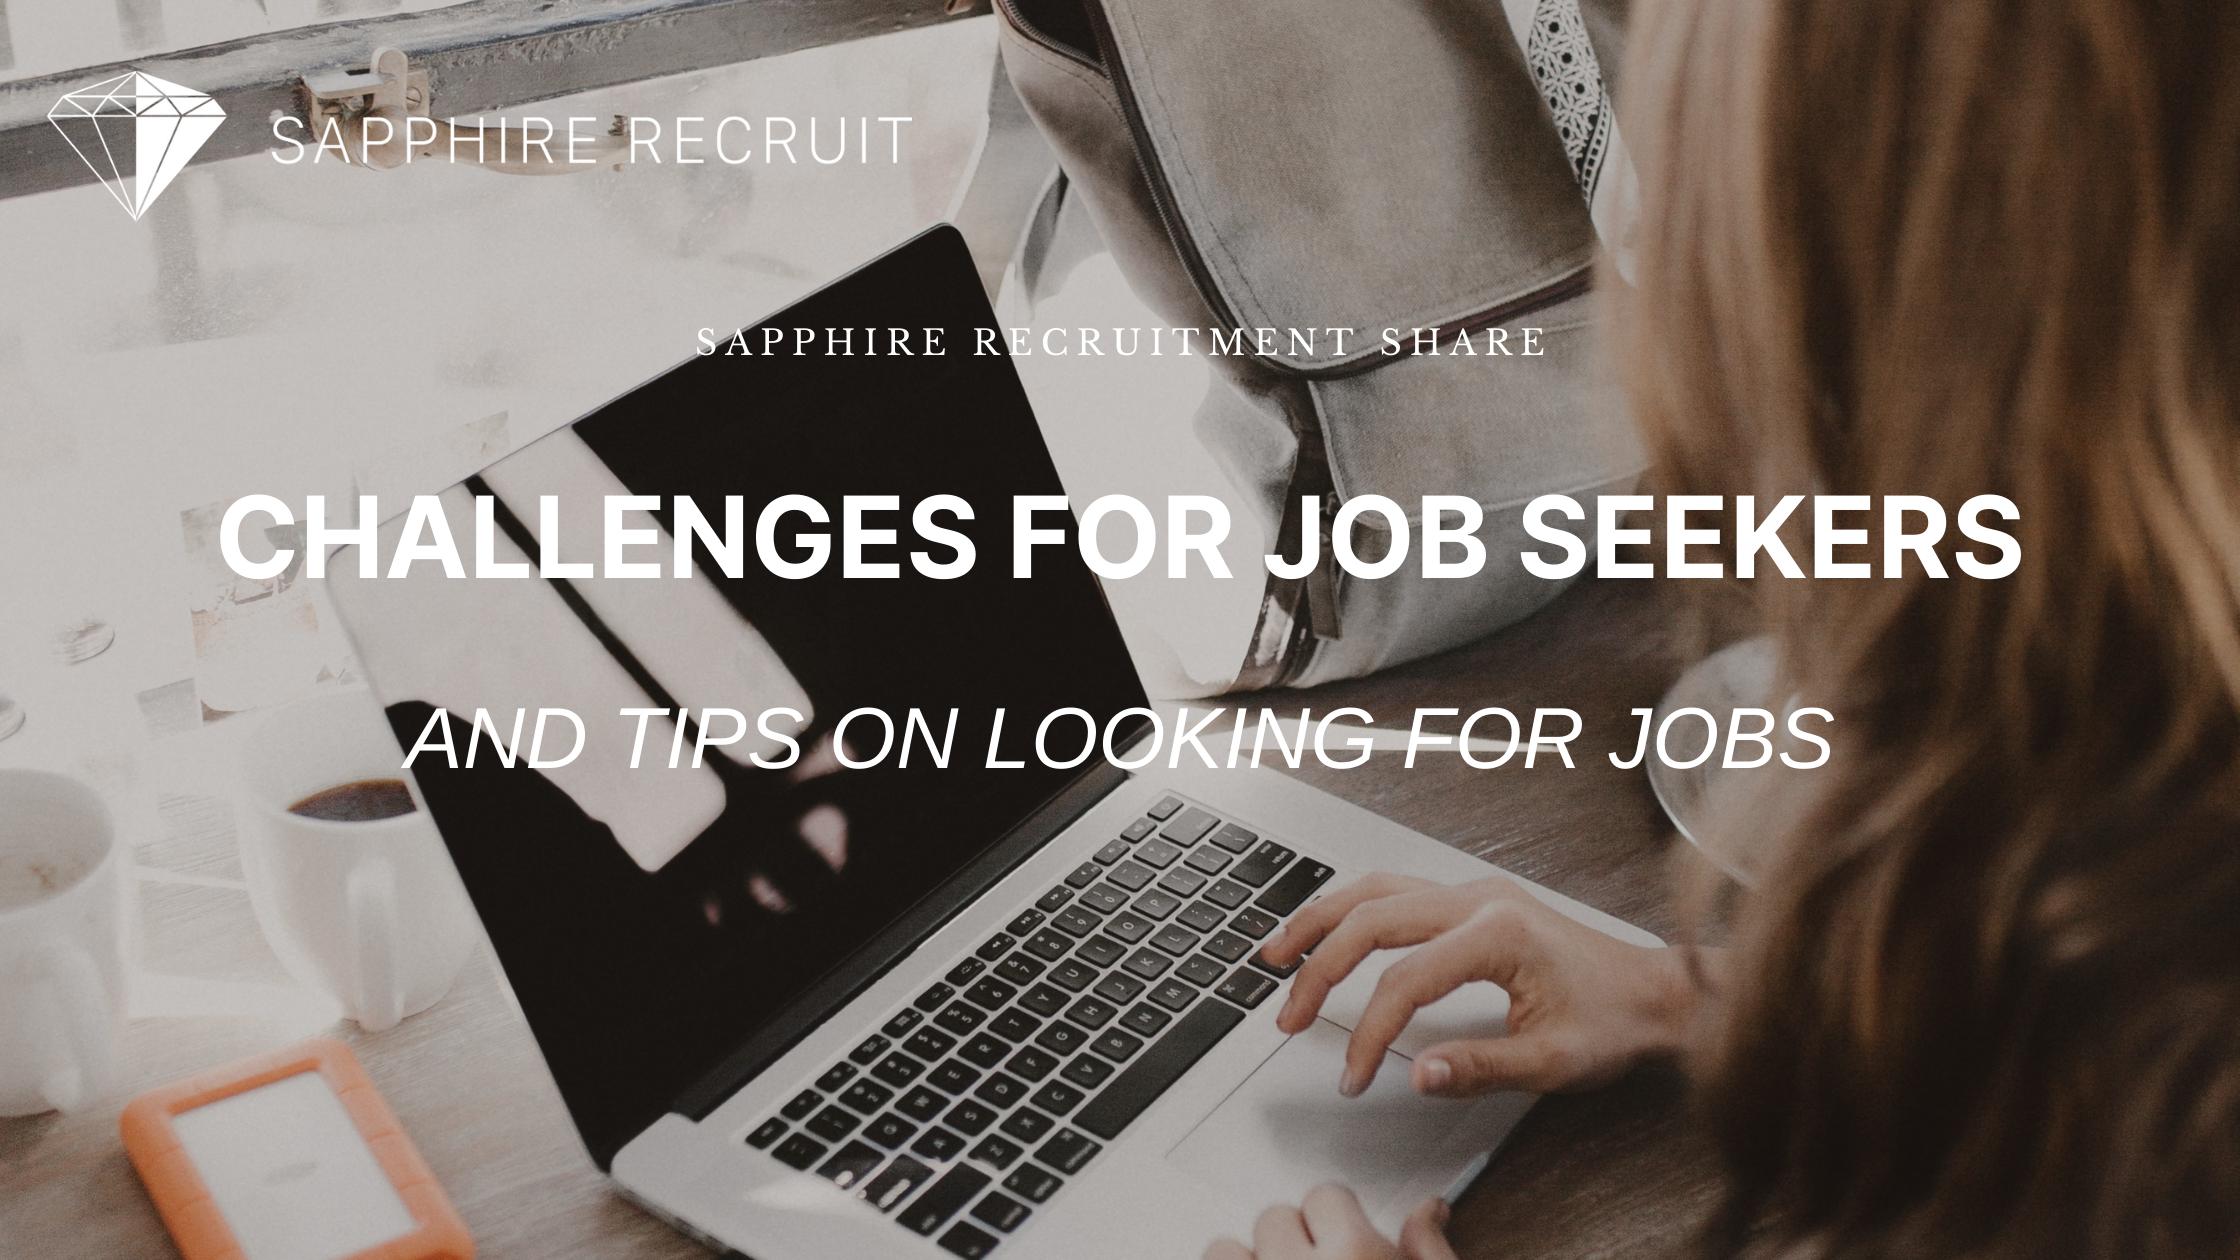 Challenges Facing Job Seekers blog header